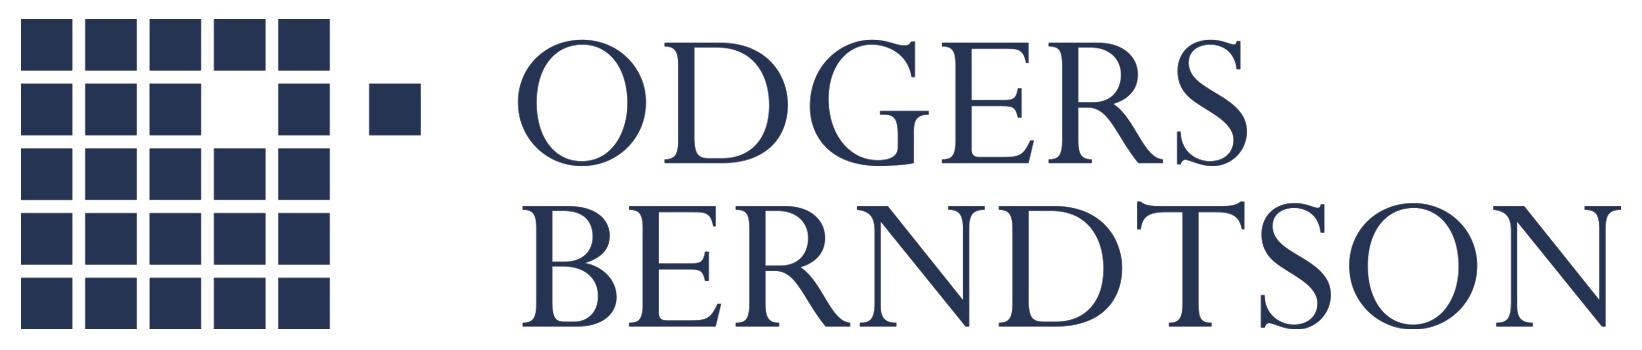 Odgers Berndtson Stacked Logo Blue.jpg